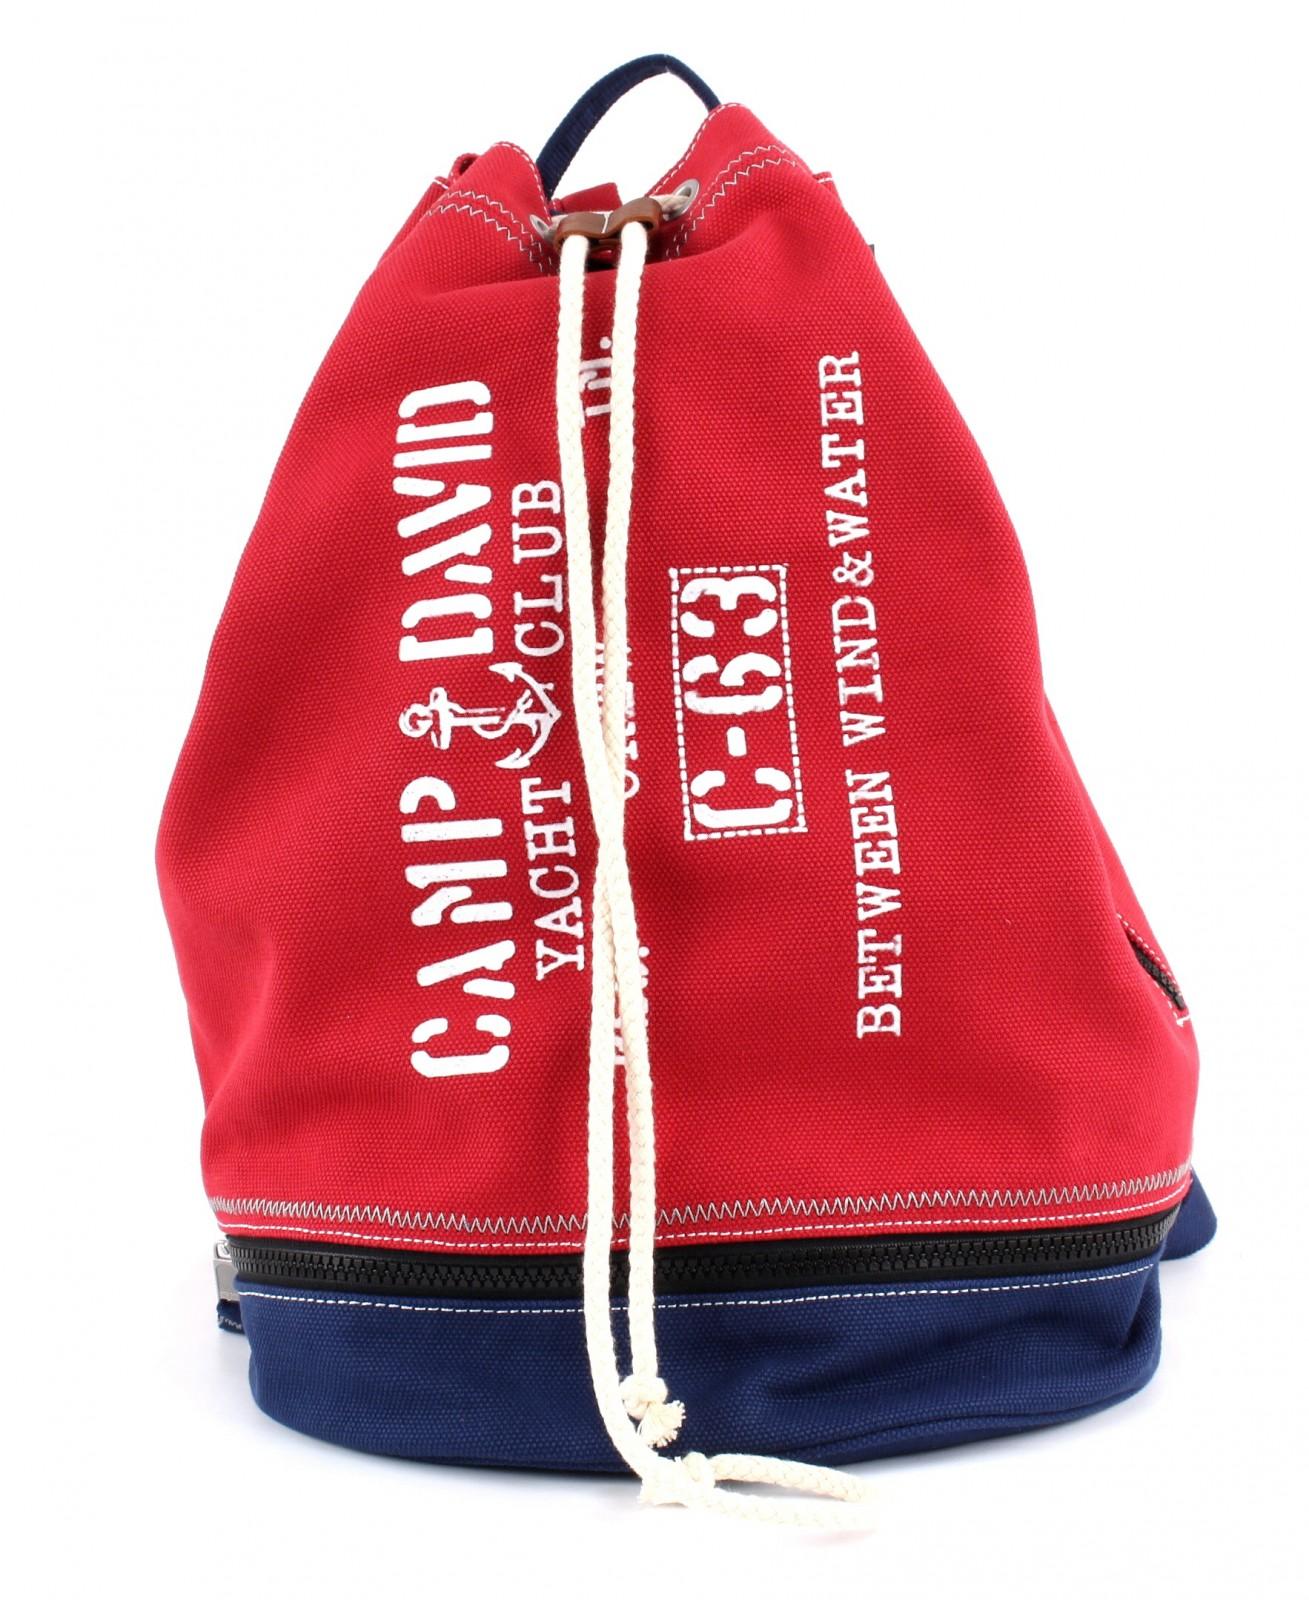 CAMP DAVID Deep River Backpack Red